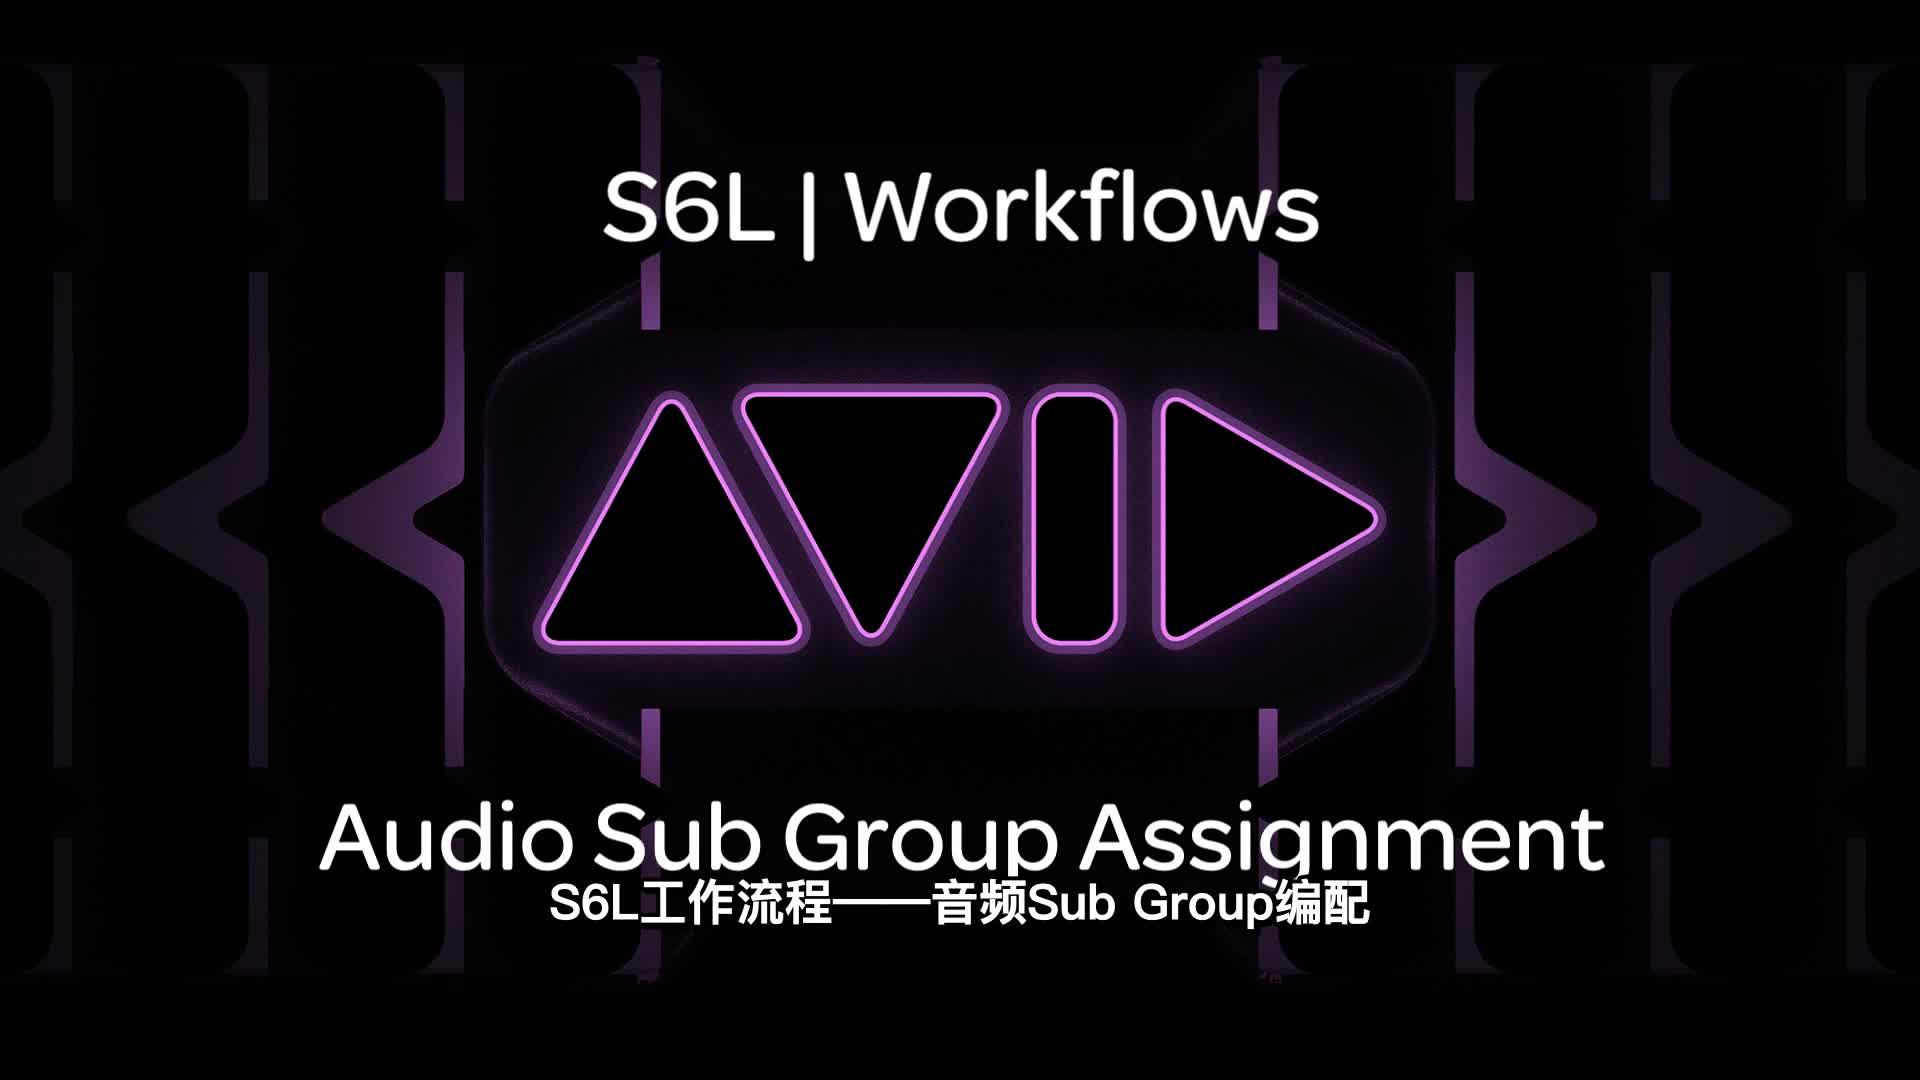 06 VENUE  S6L|Workflows Audio Sub Group Assignment